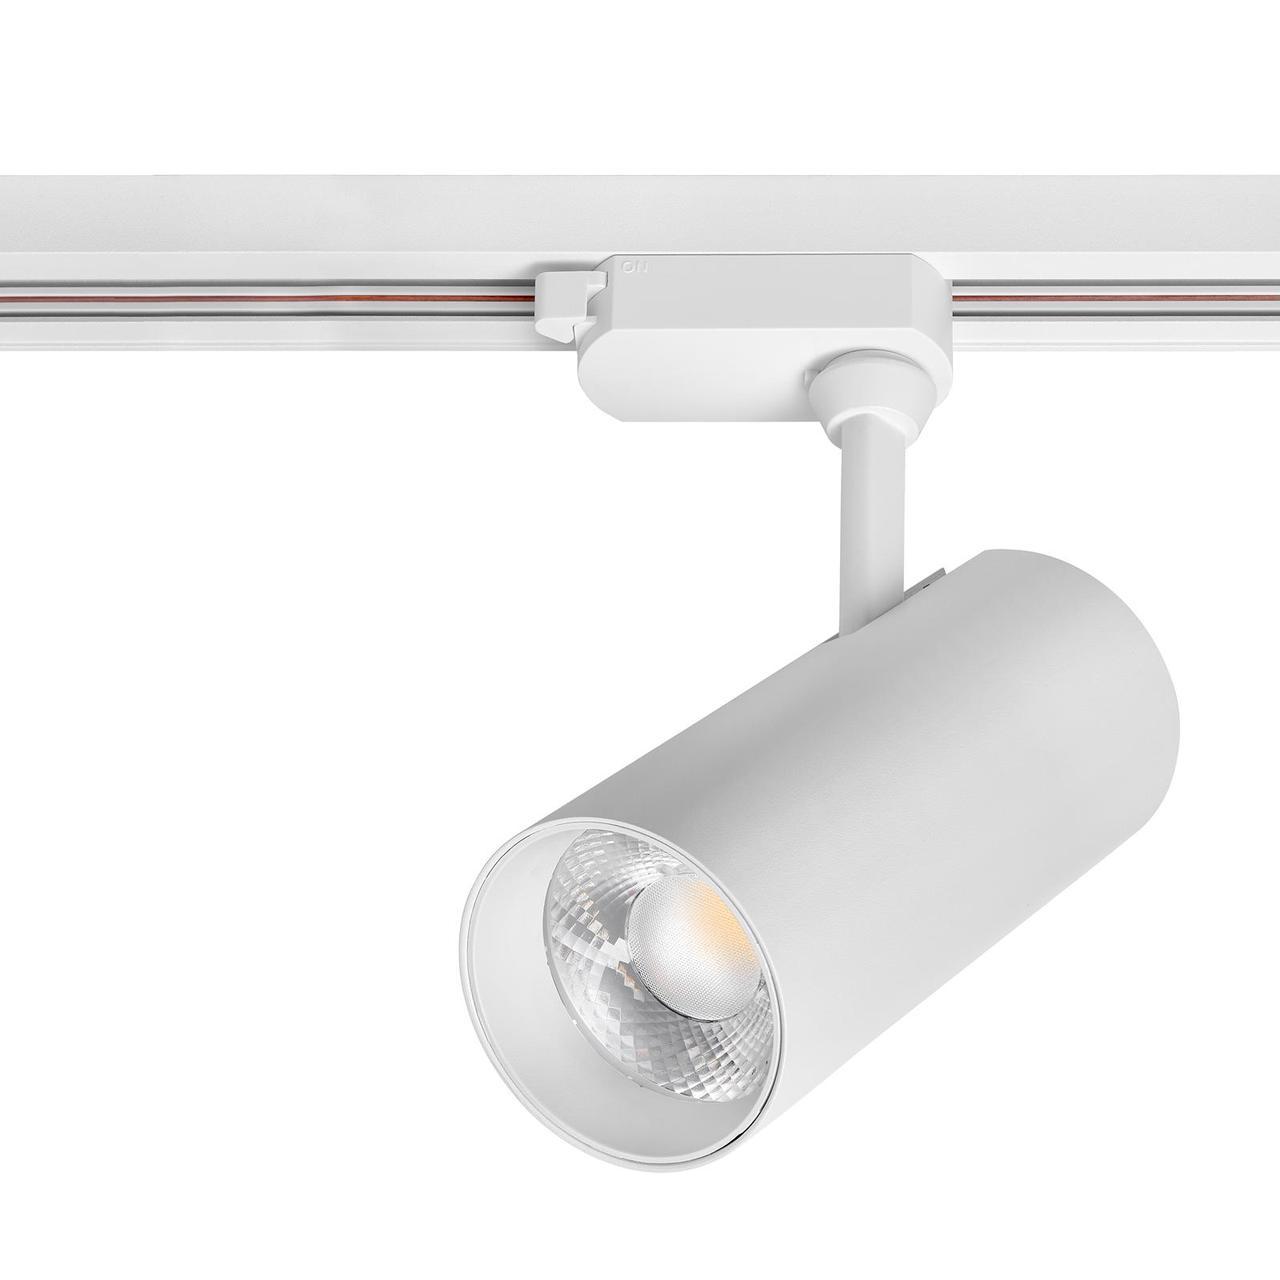 Лед прожектор трековый DELUX TL04 20 Вт  24°  4000K  белый